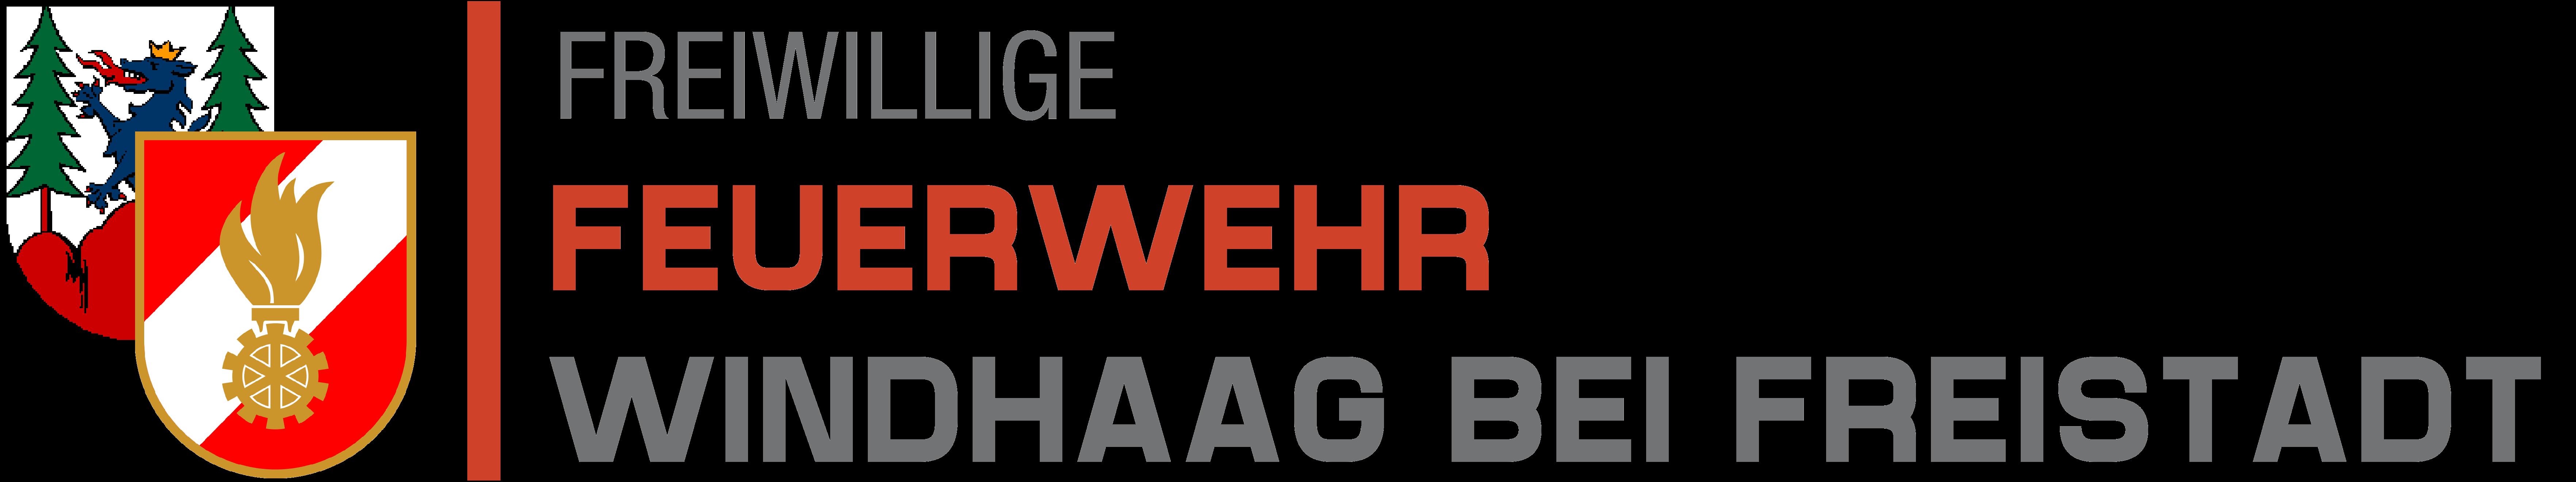 FF Windhaag bei Freistadt